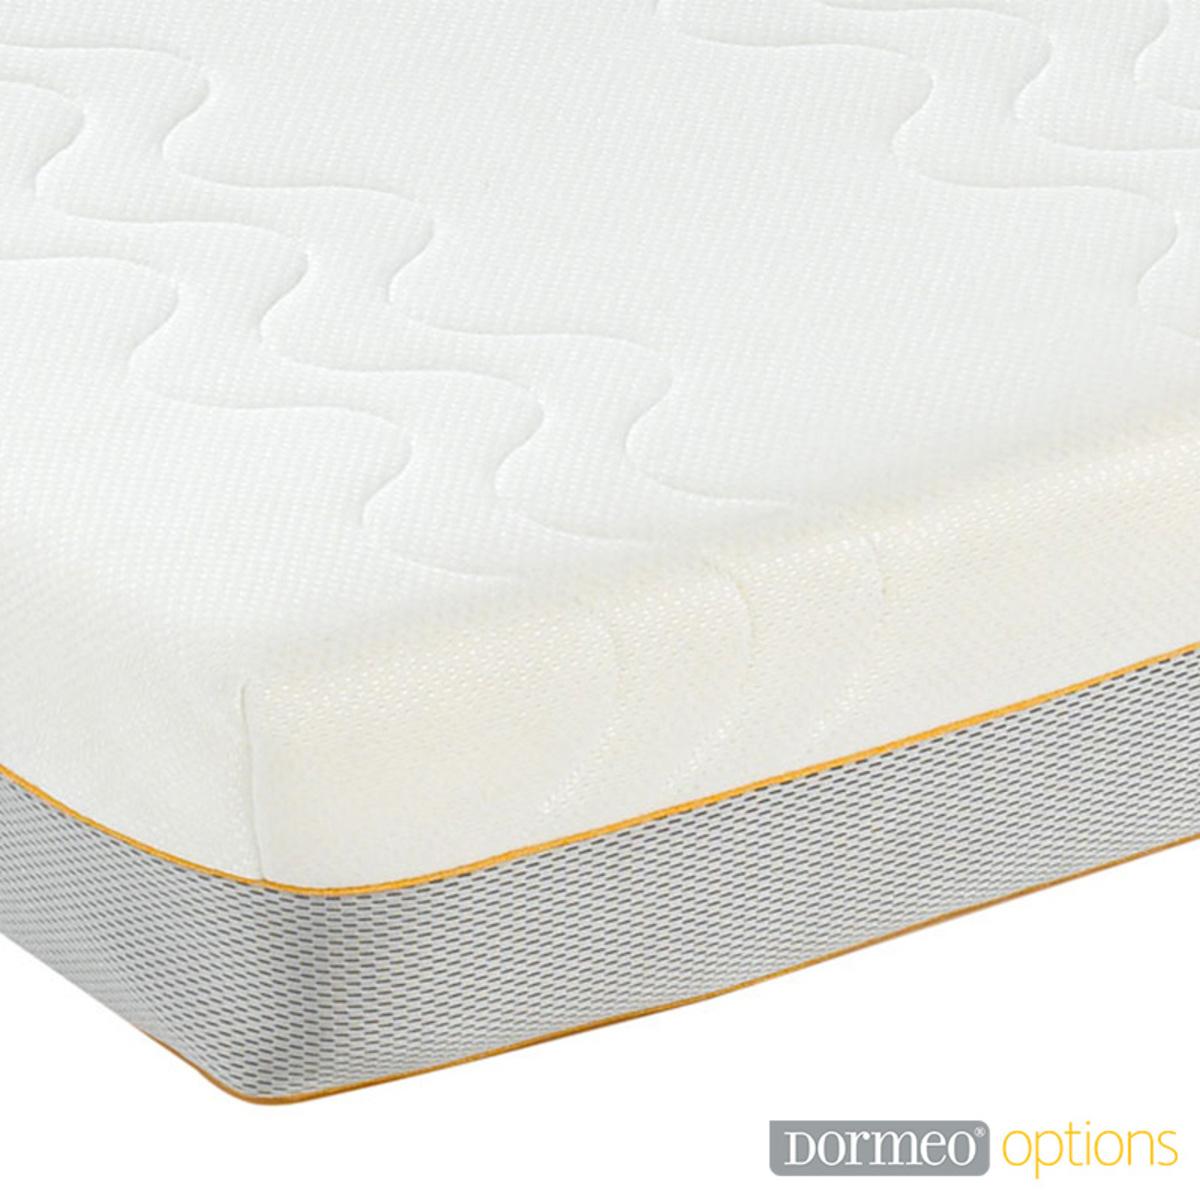 Dormeo Options Hybrid Mattress - Single 90cm £99.99 @ Costco